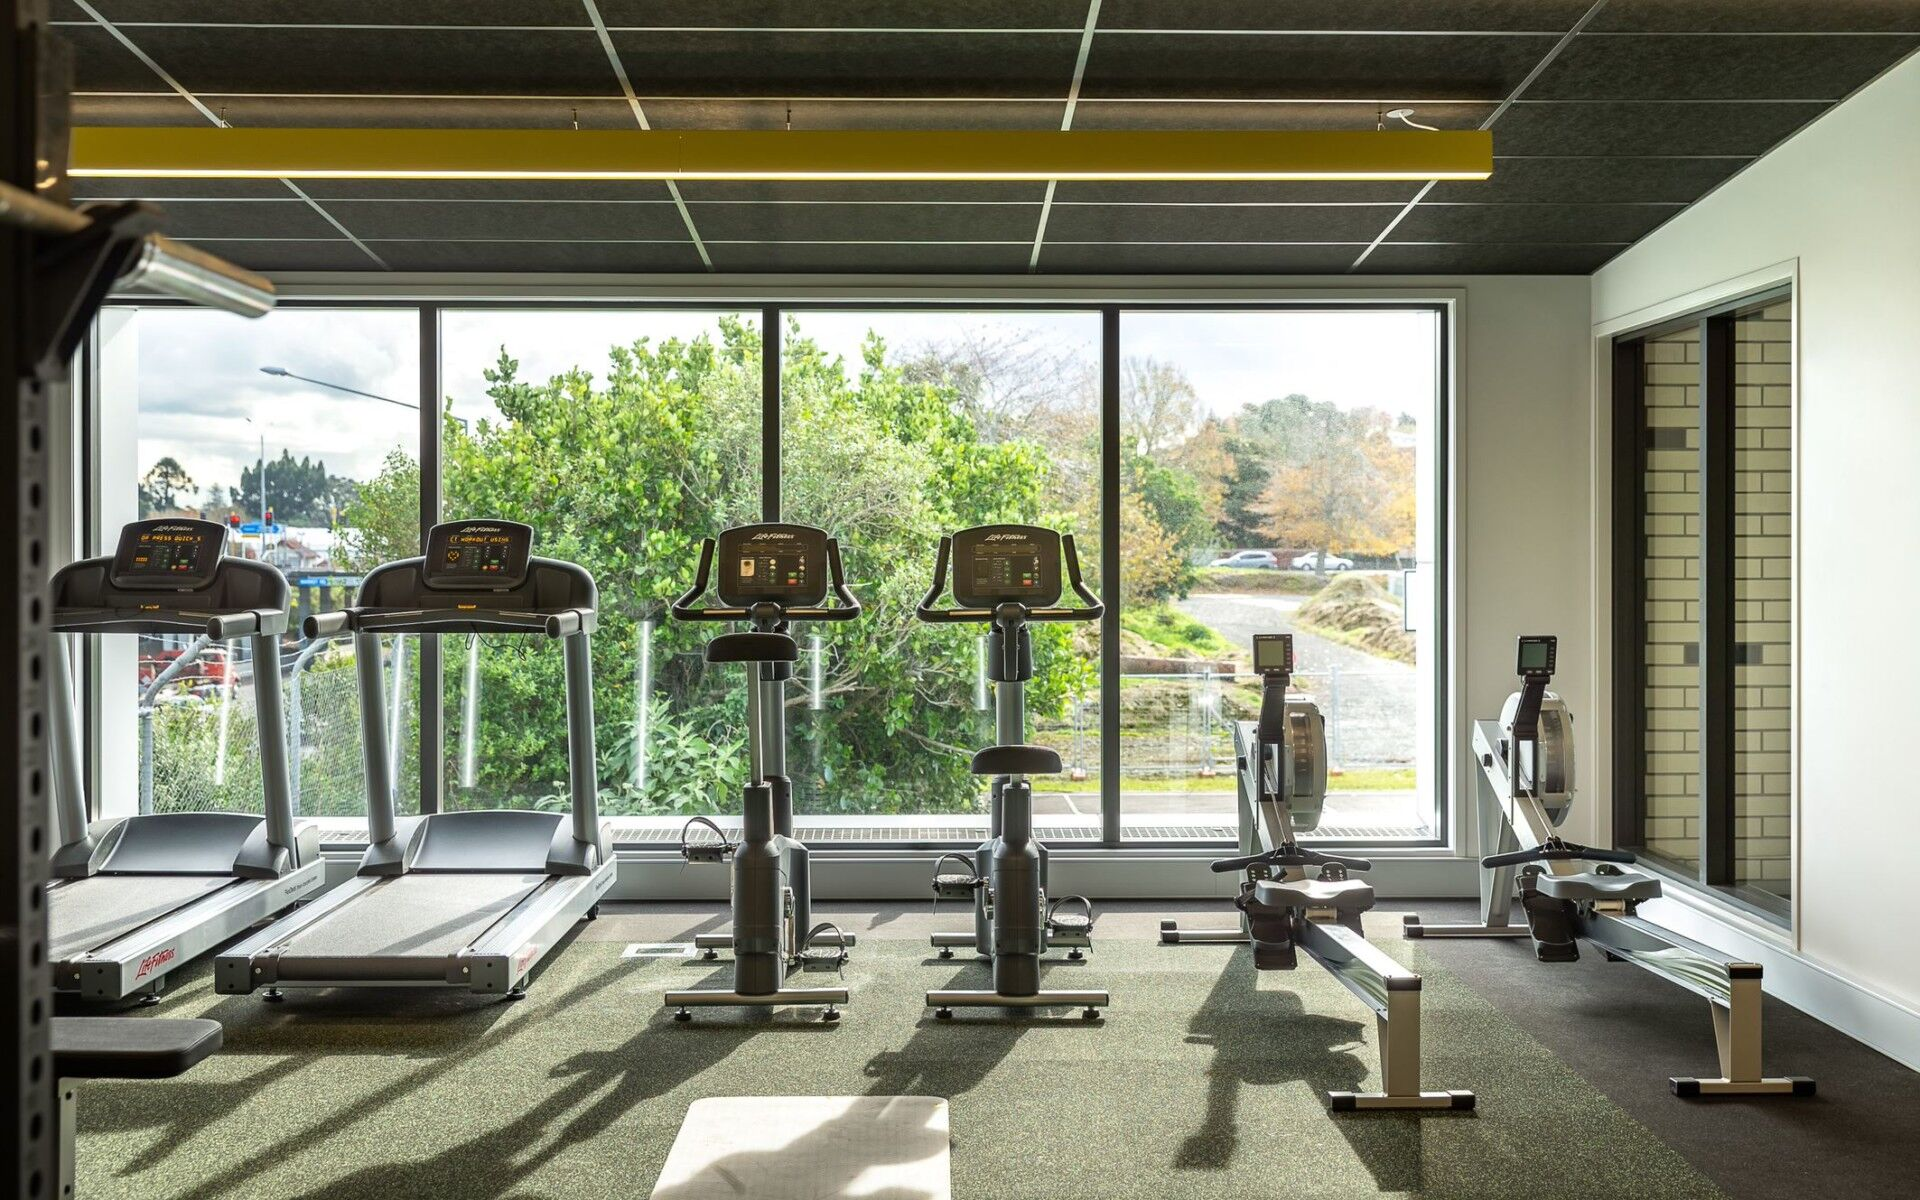 Dilworth sports centre gym